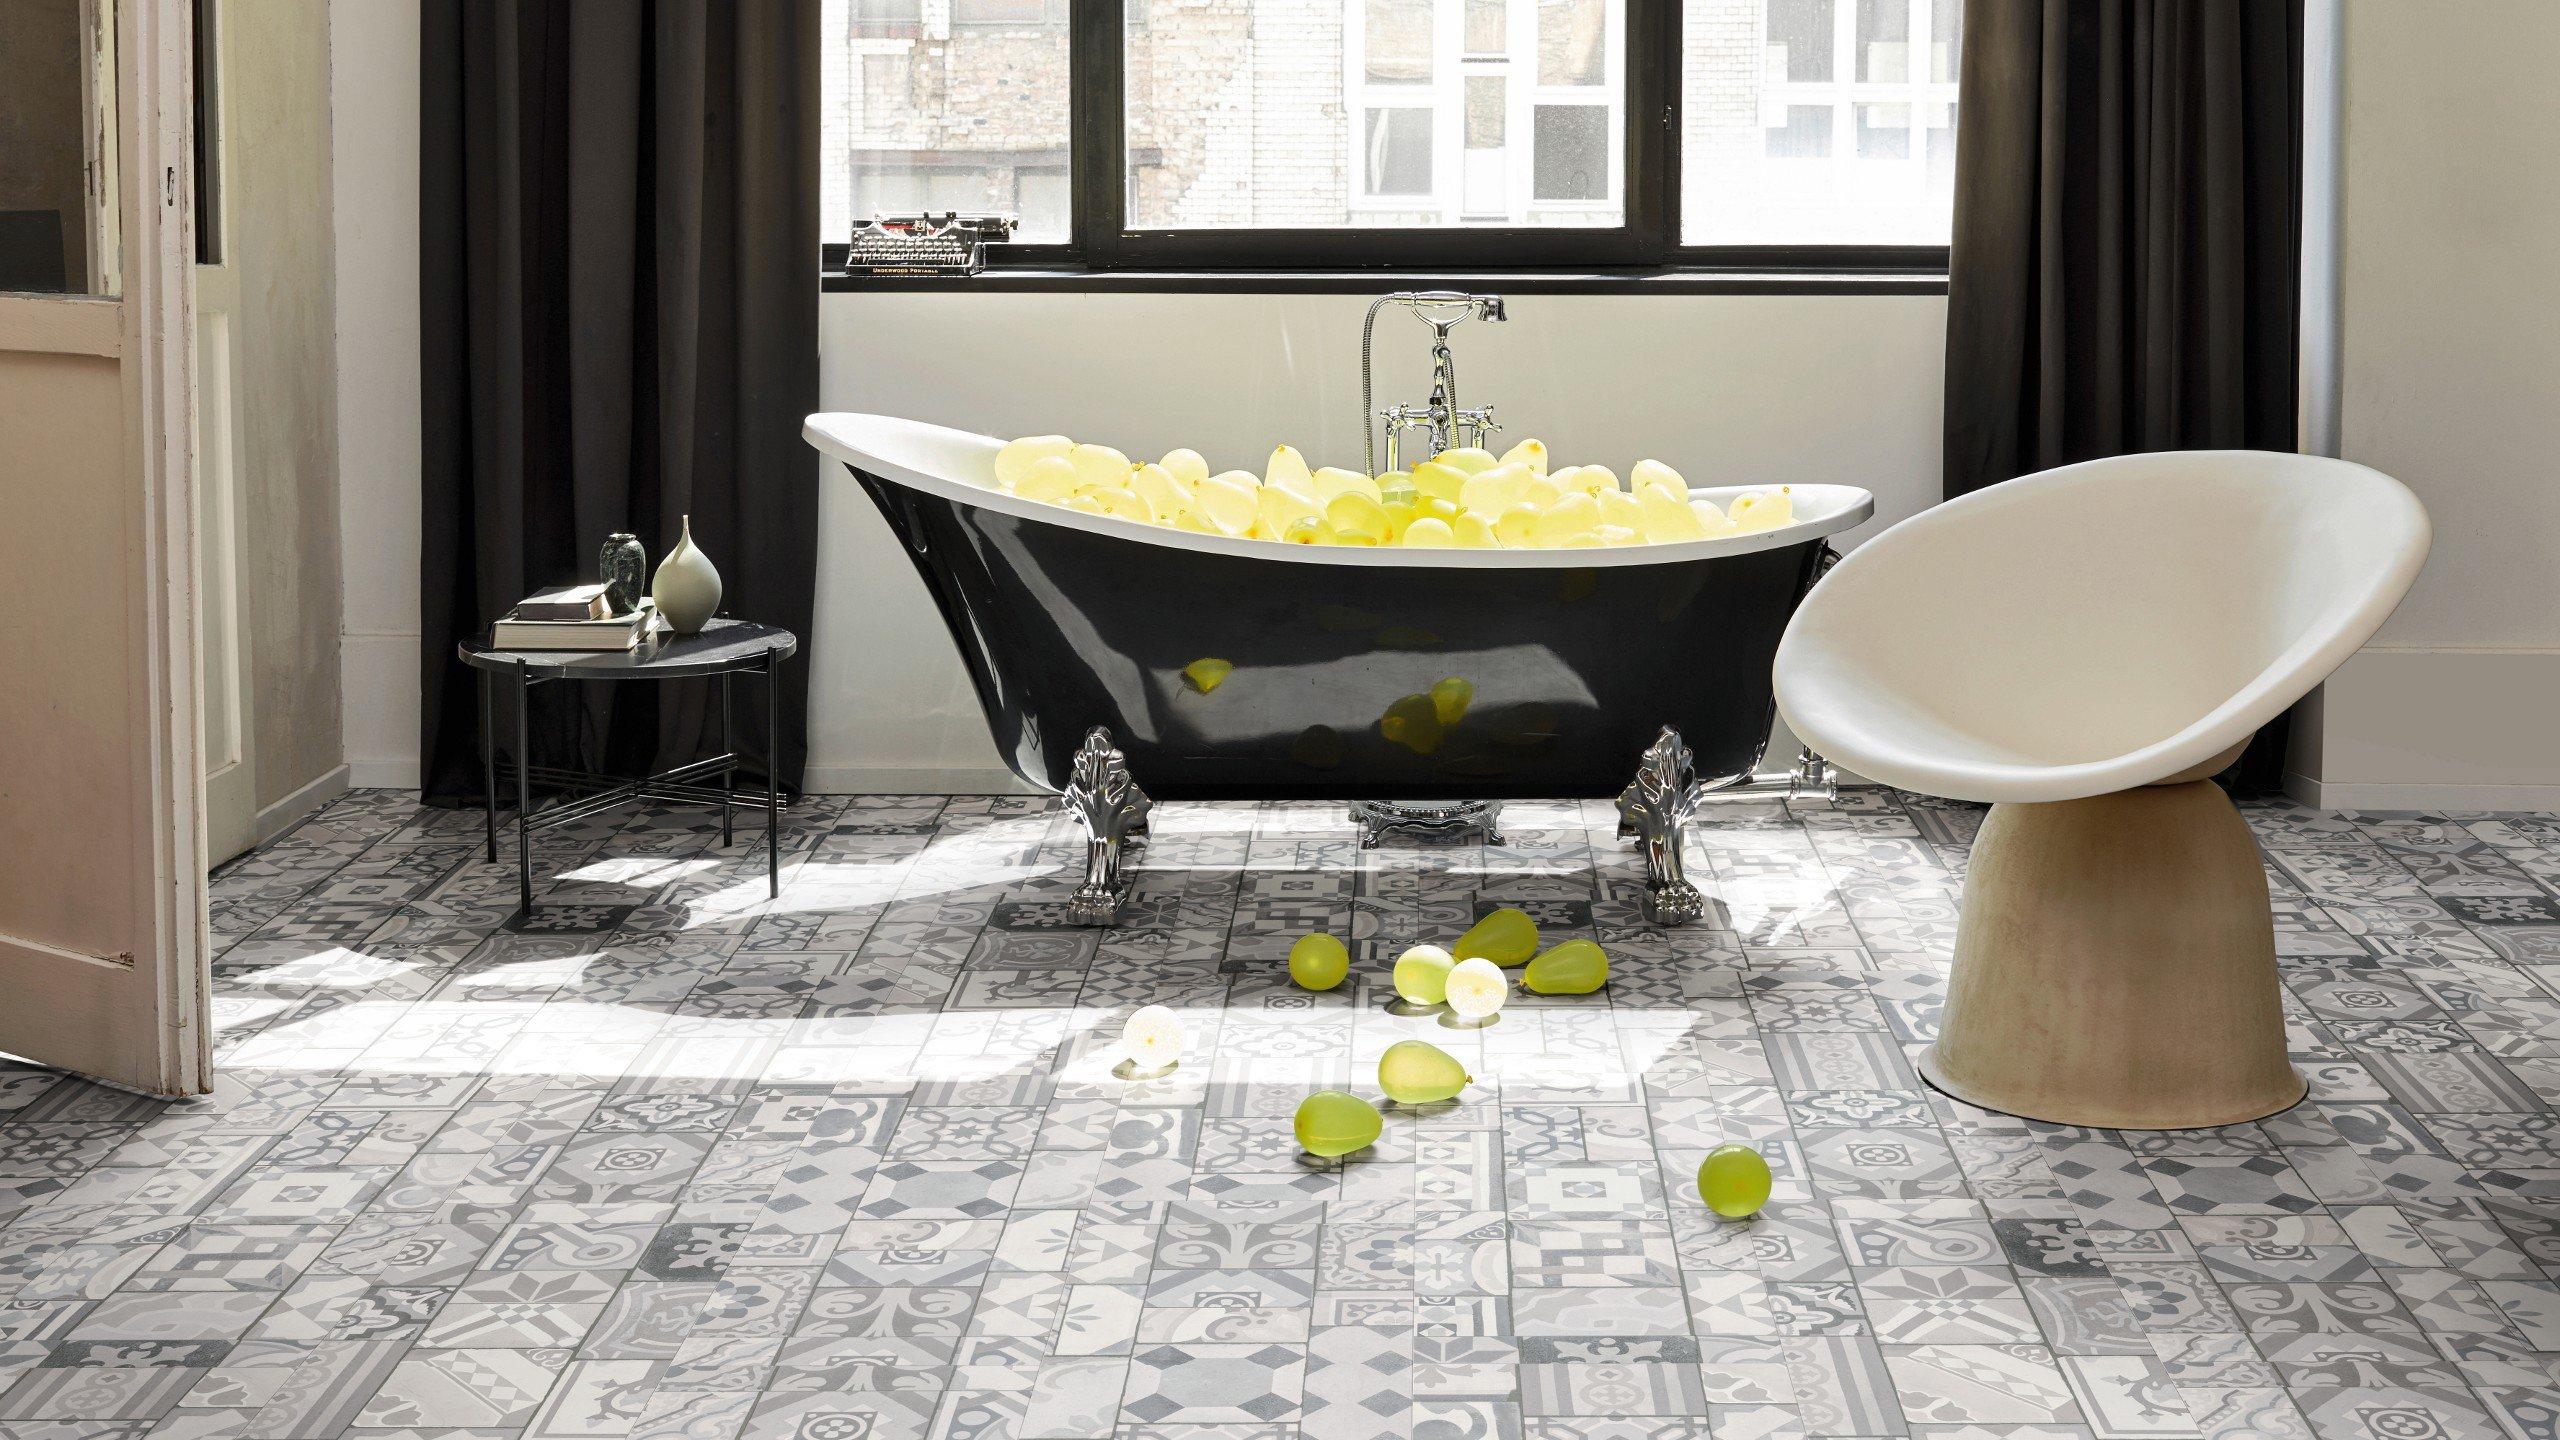 vinyl honig webseite. Black Bedroom Furniture Sets. Home Design Ideas